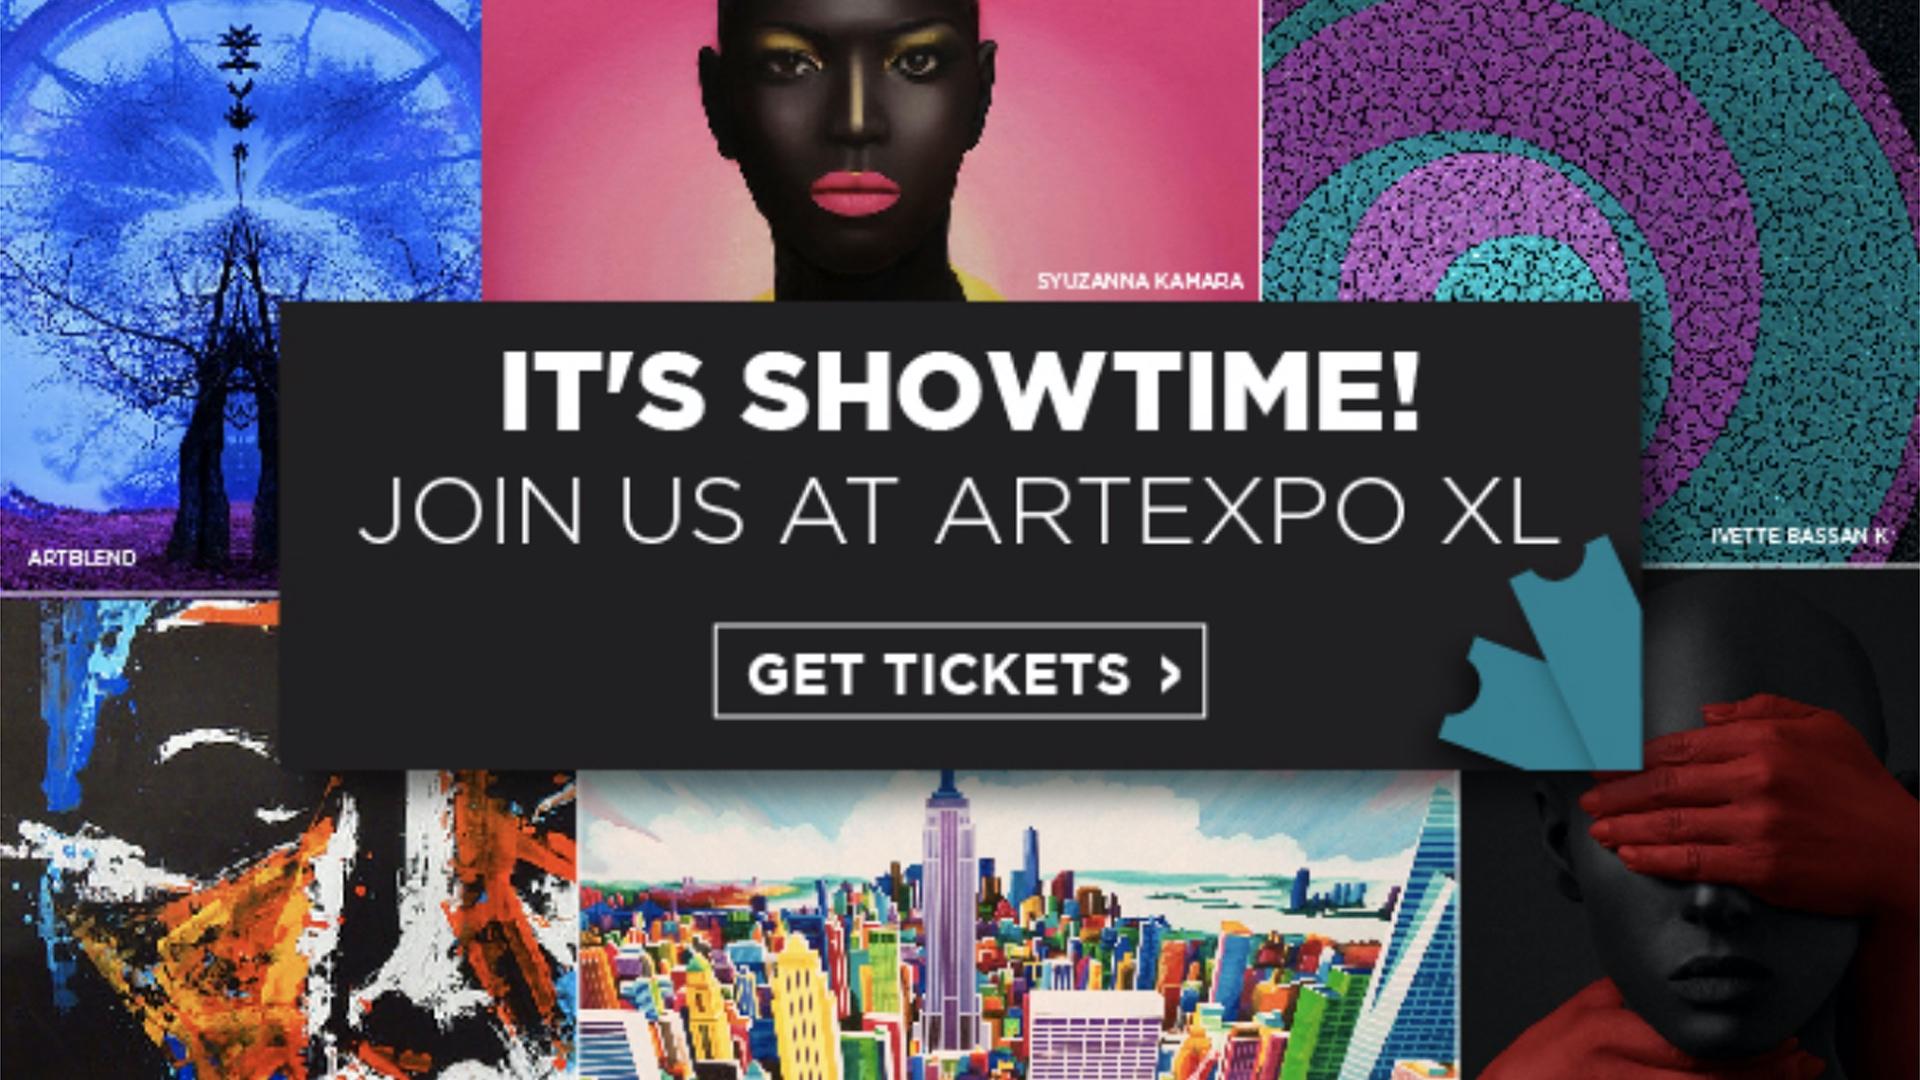 Artexpo New York Newsletter. It all starts tomorrow at Artexpo New York